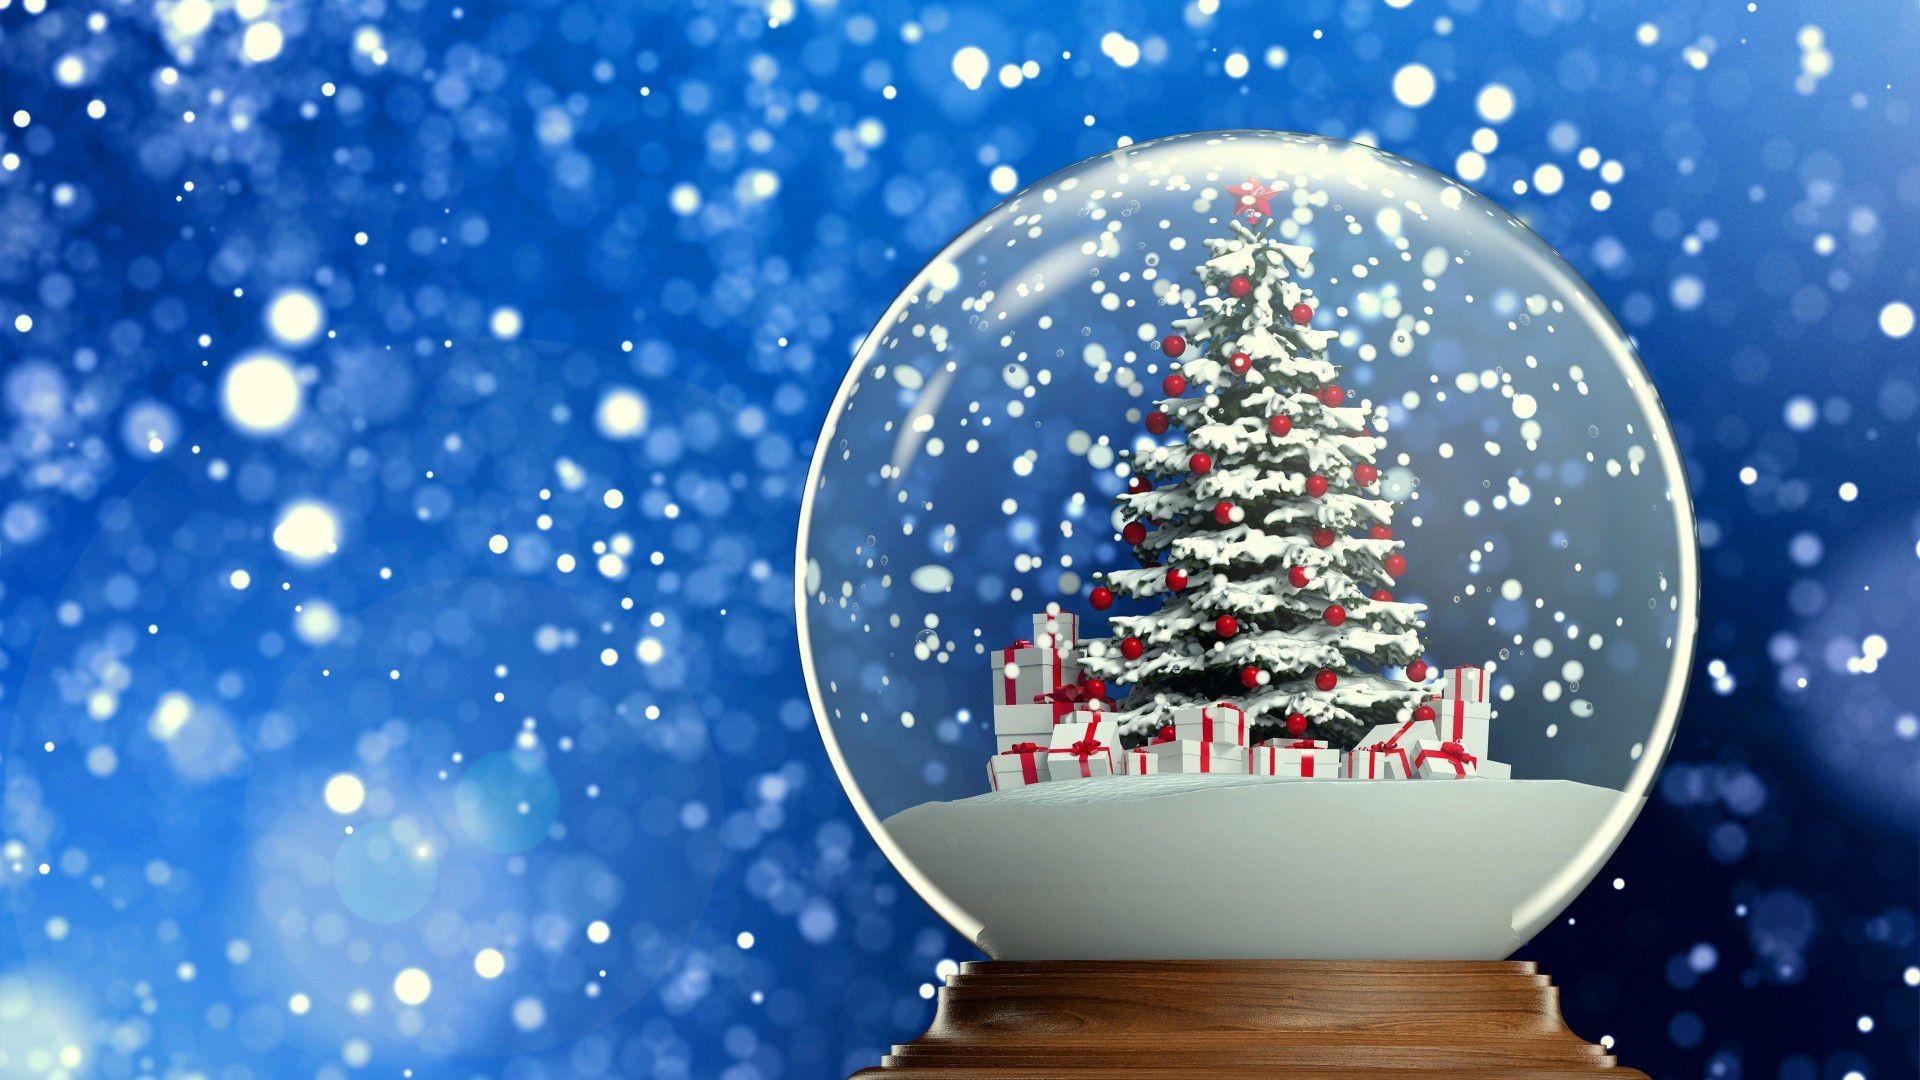 Christmas Snow Wallpaper ·①